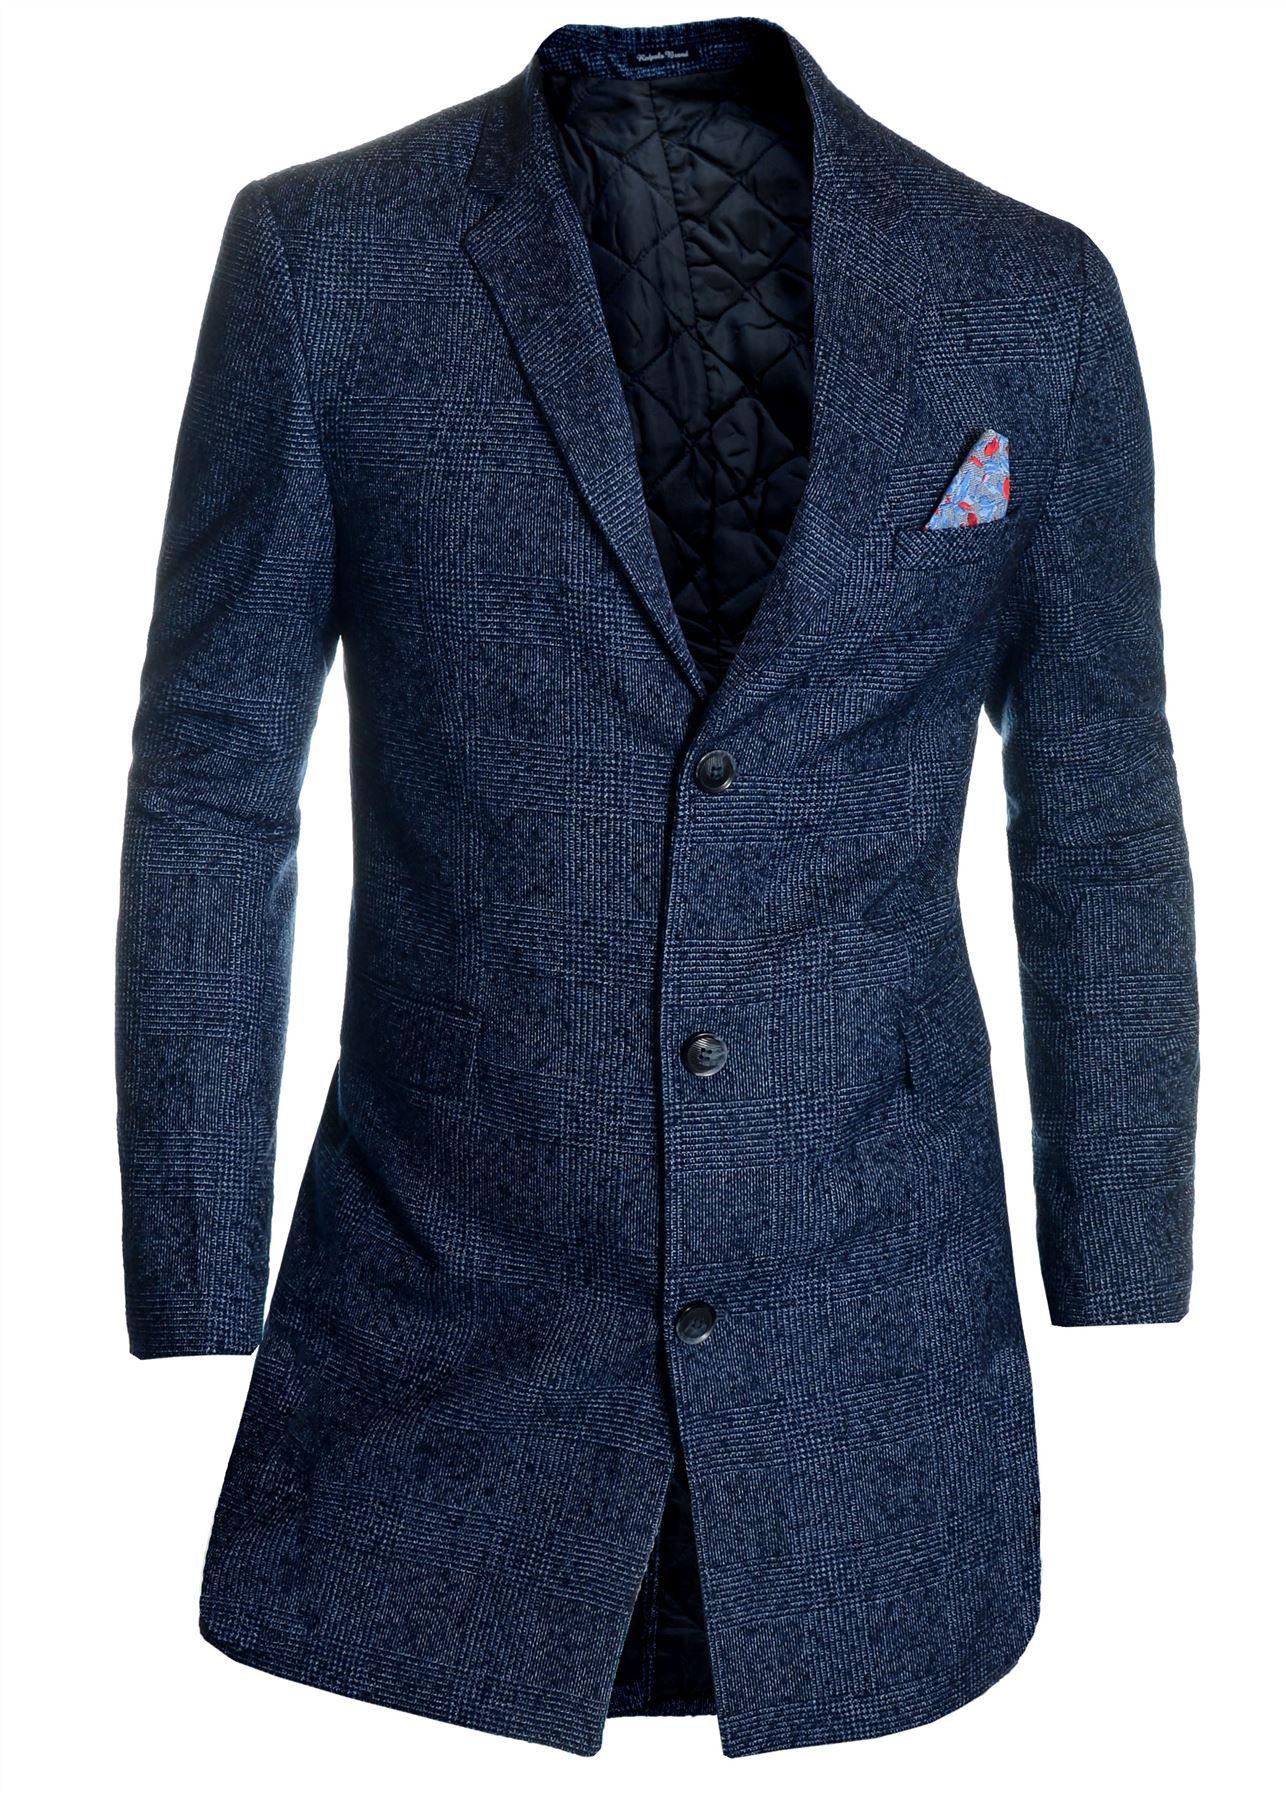 Men-039-s-Checkered-Coat-3-4-Long-Tweed-Cashmere-Wool-Trendy-Formal-Winter-Overcoat thumbnail 7